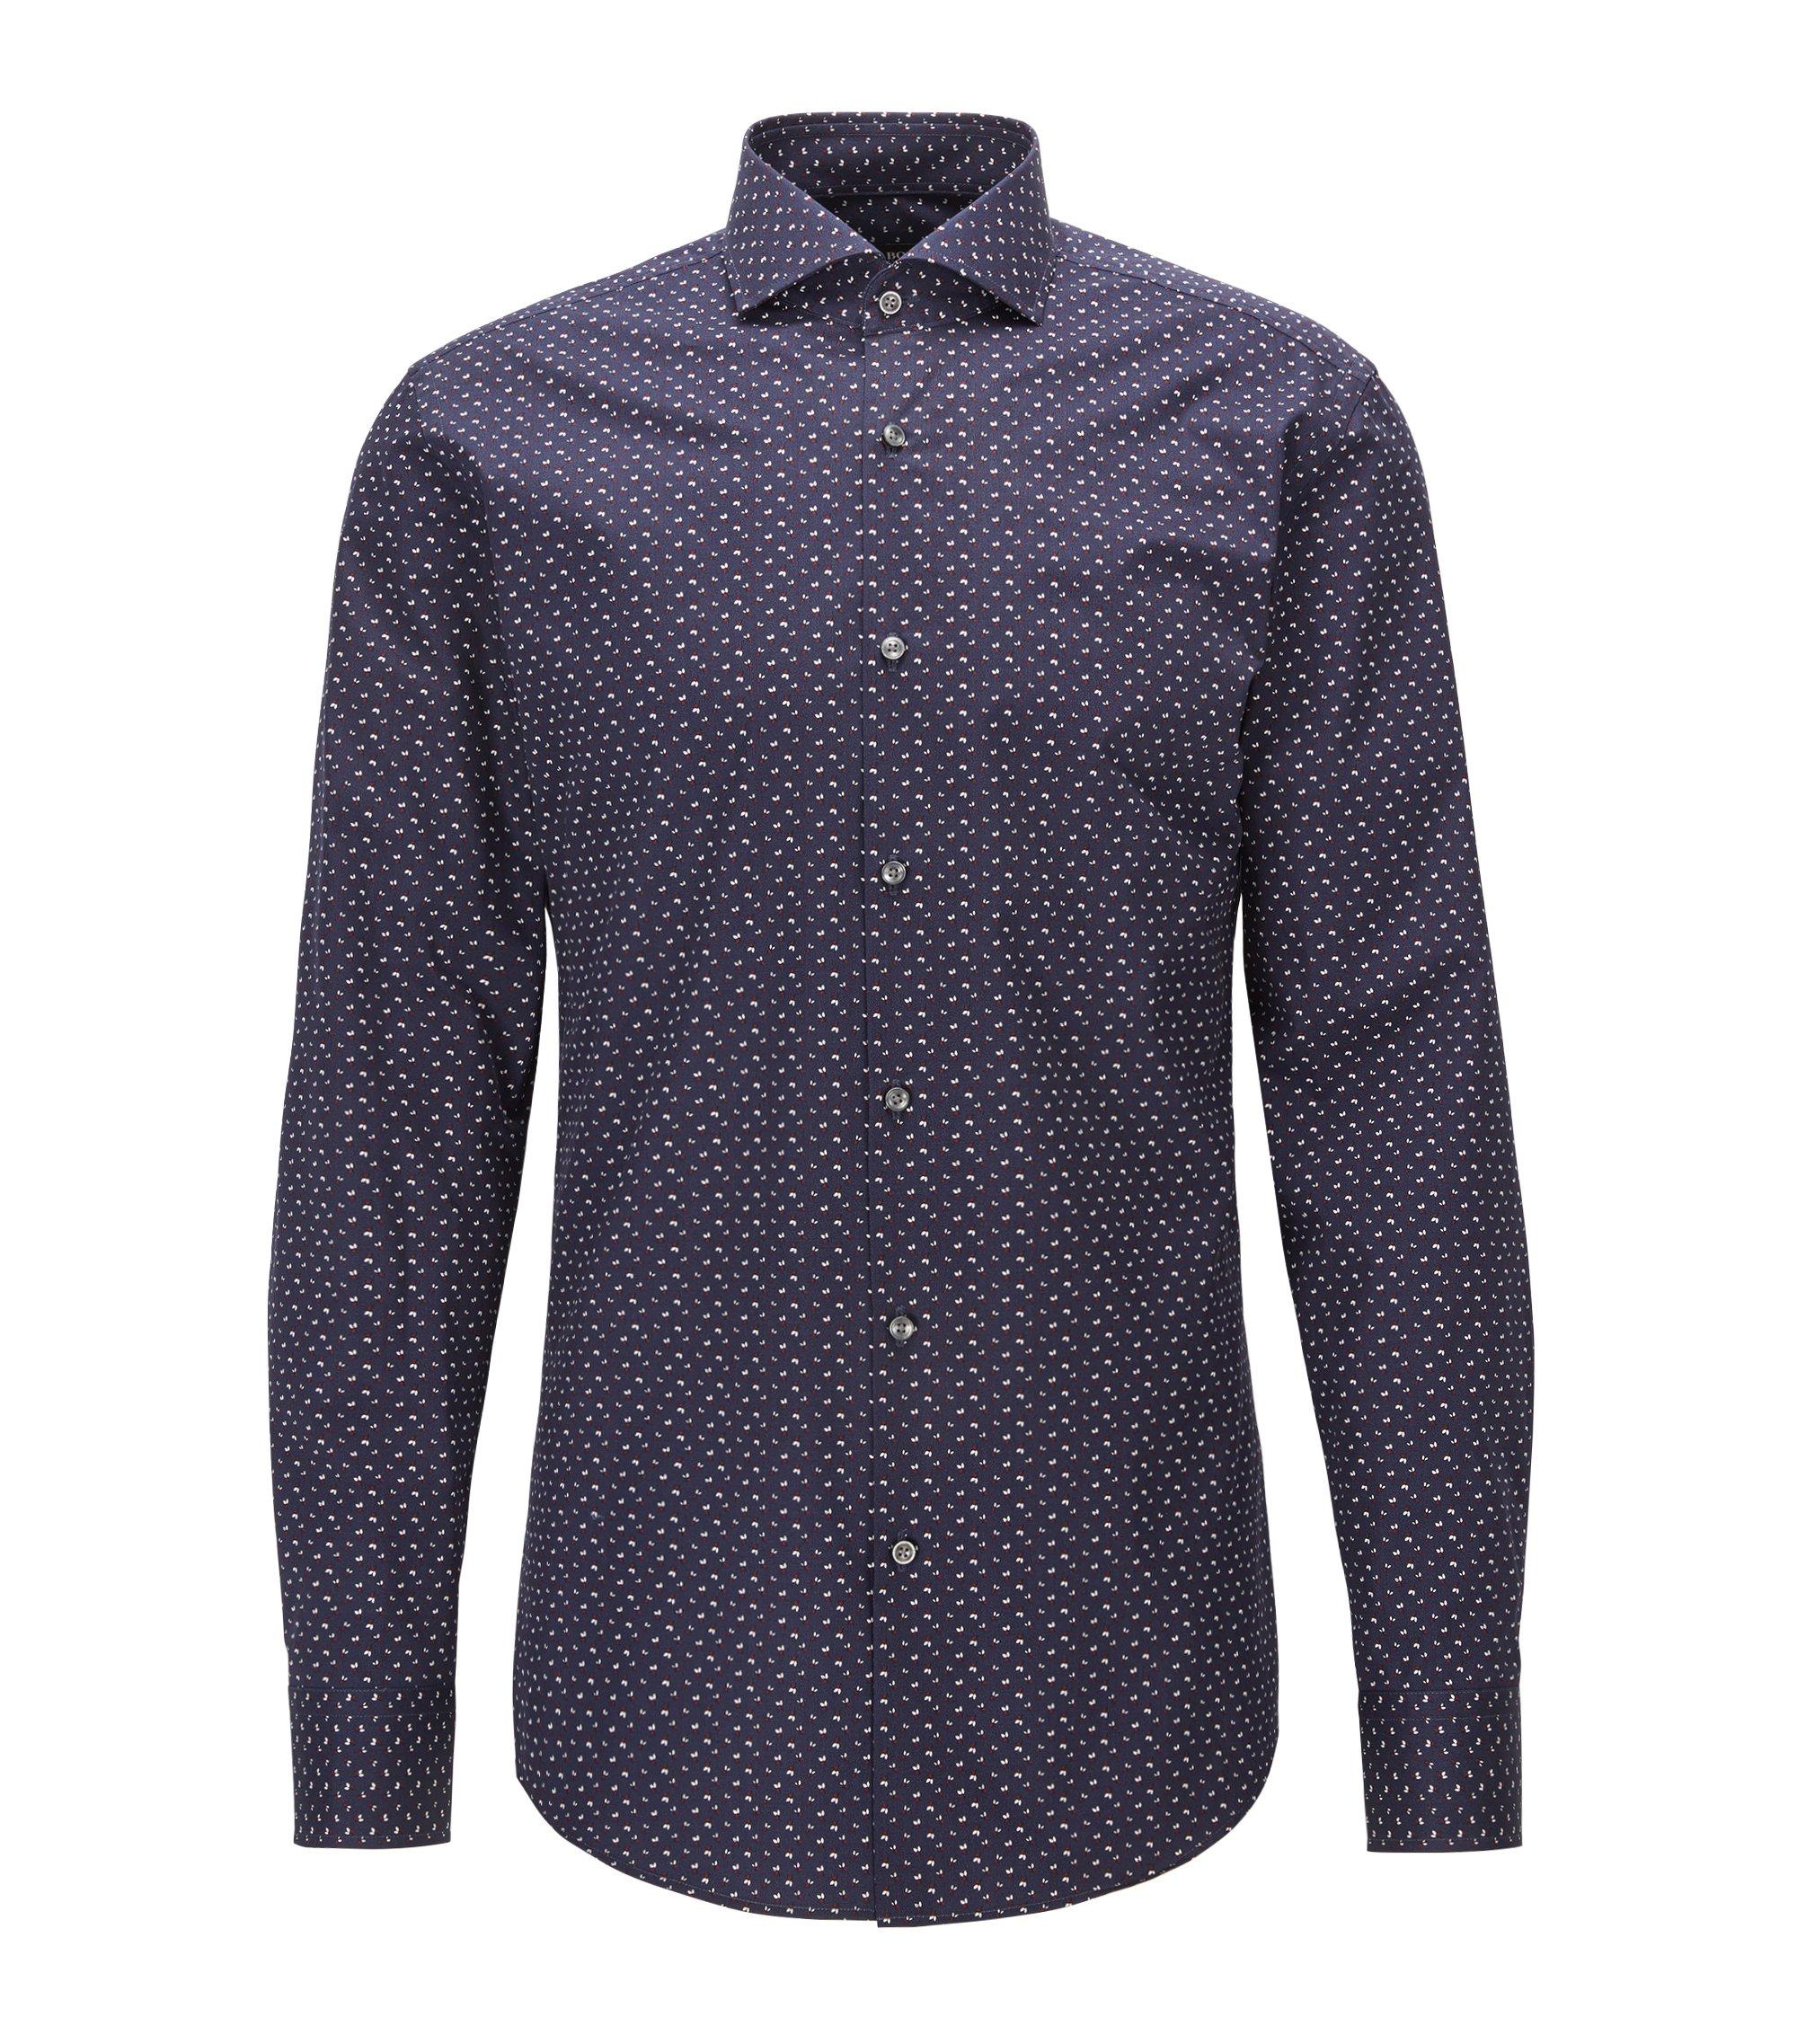 Slim-fit shirt in printed cotton poplin, Dark Blue